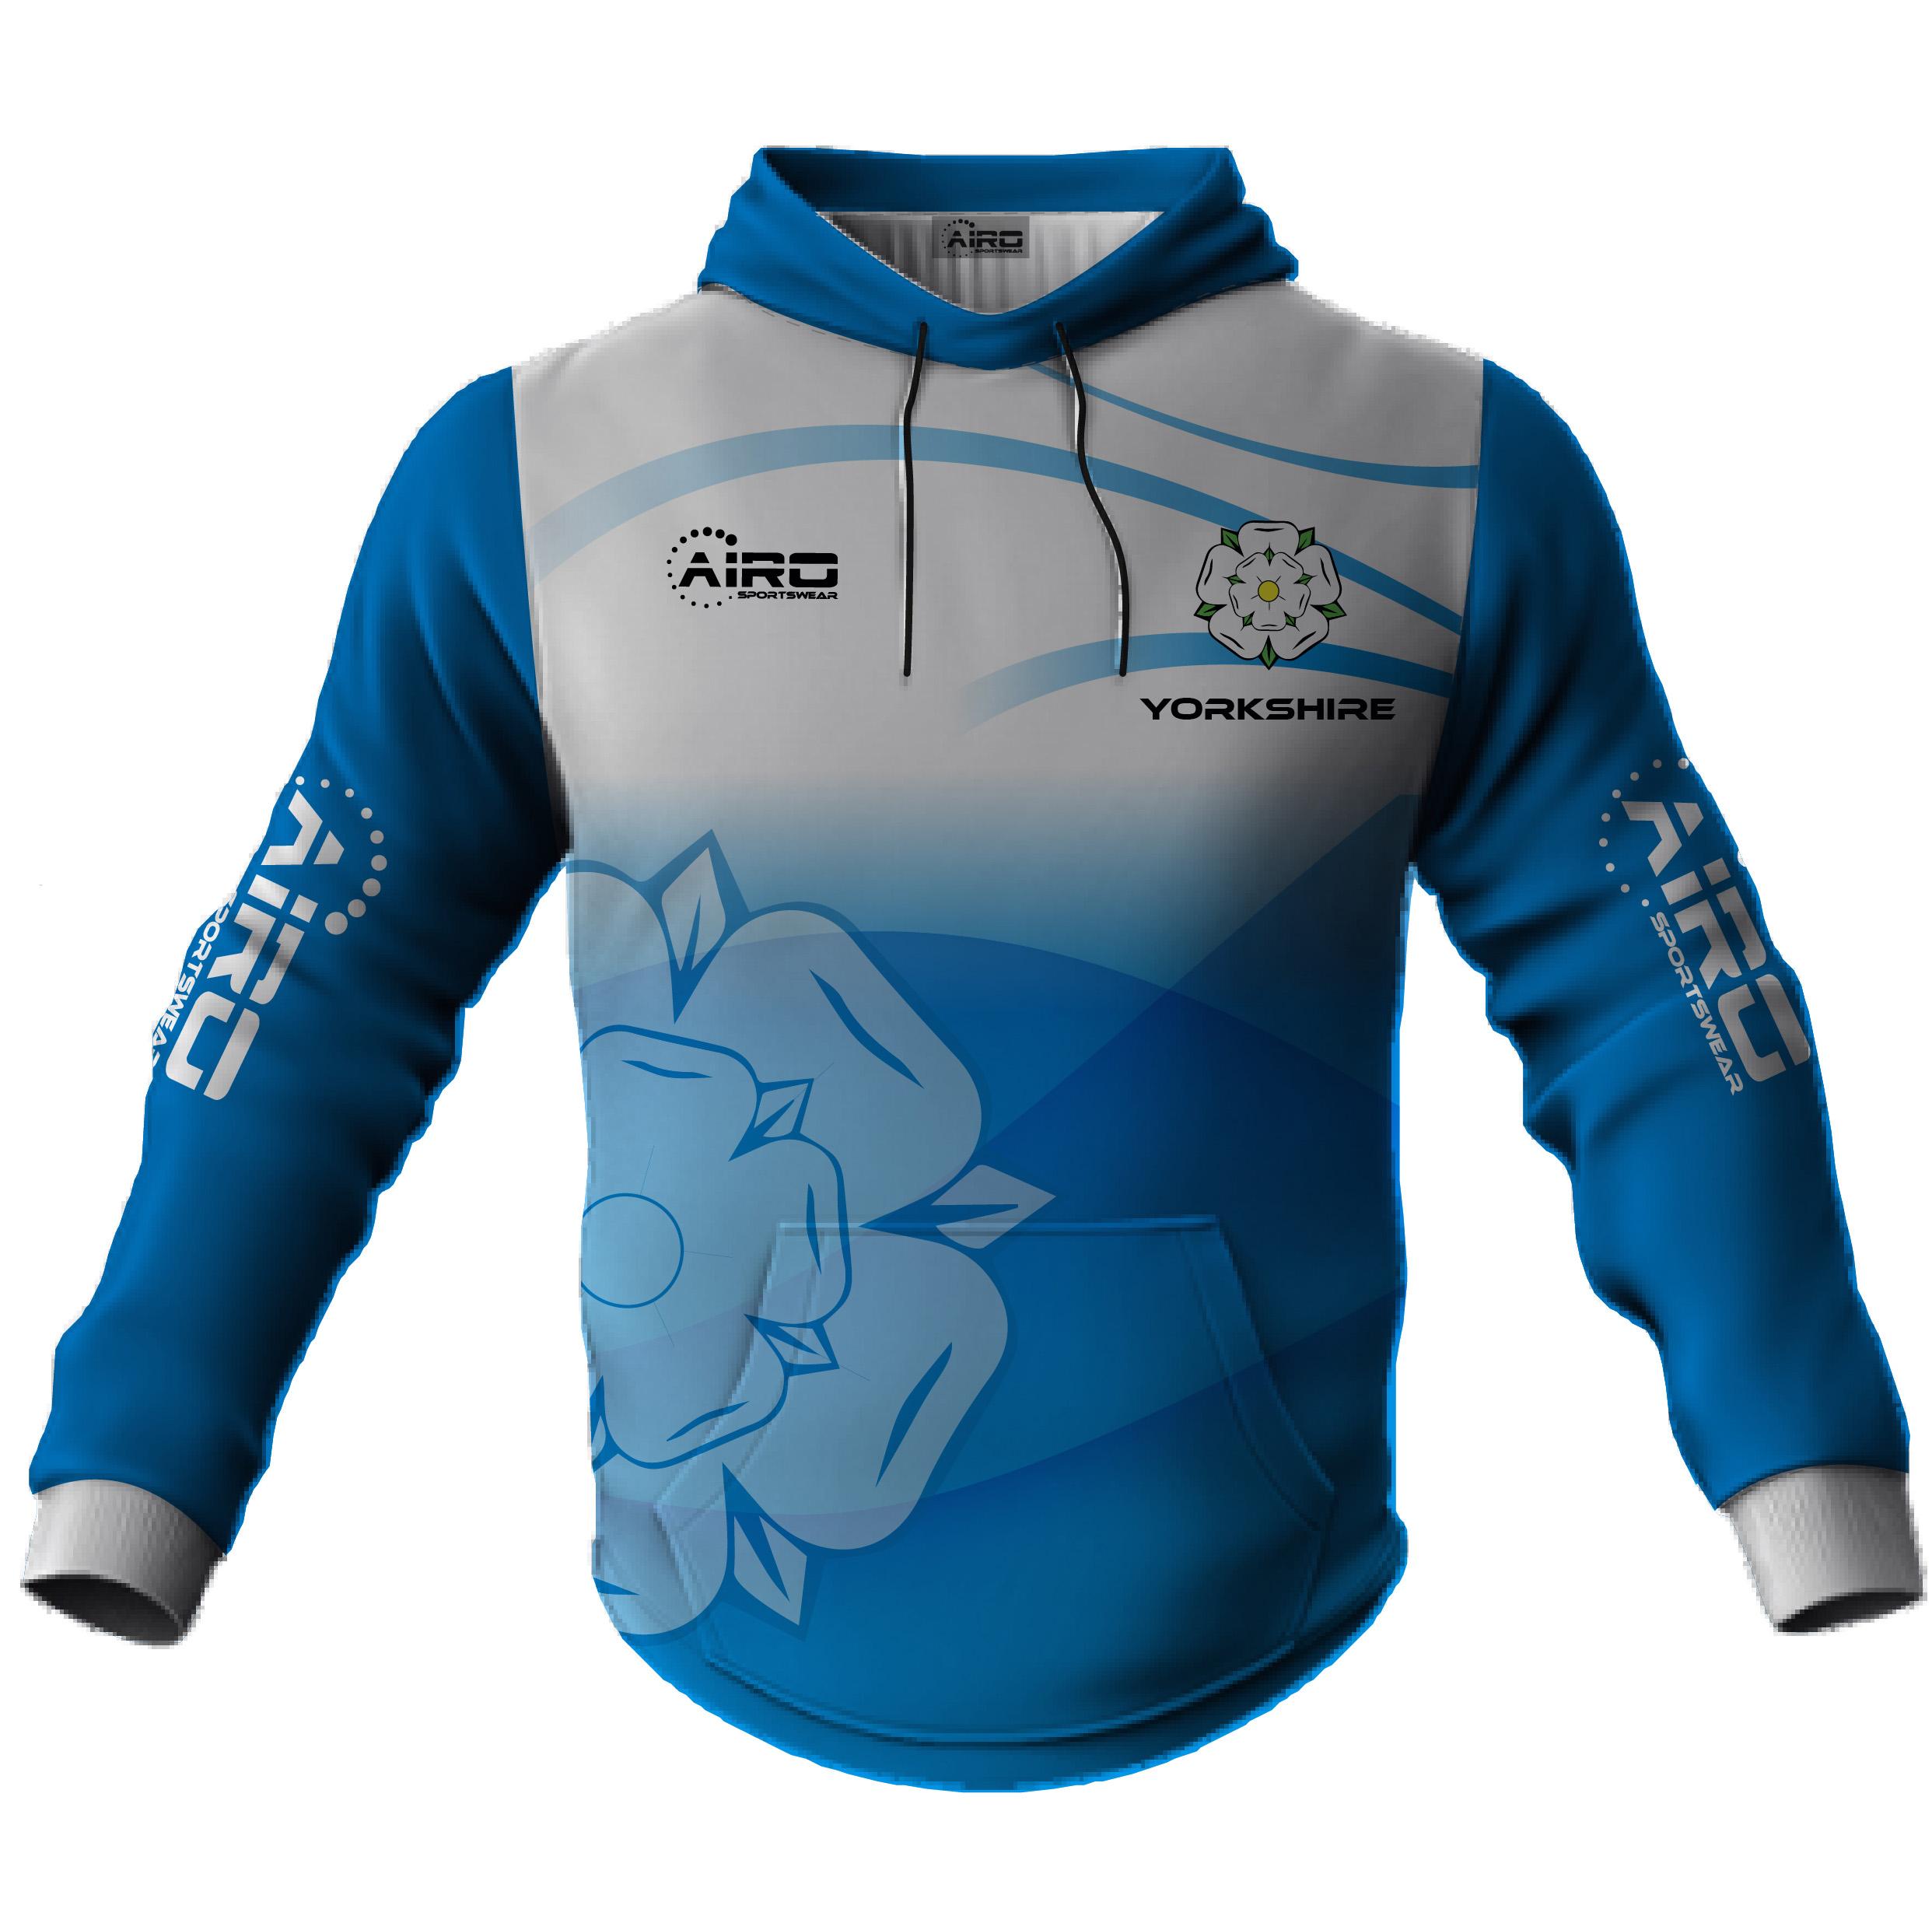 Image of Airosportswear Yorkshire Hoodie